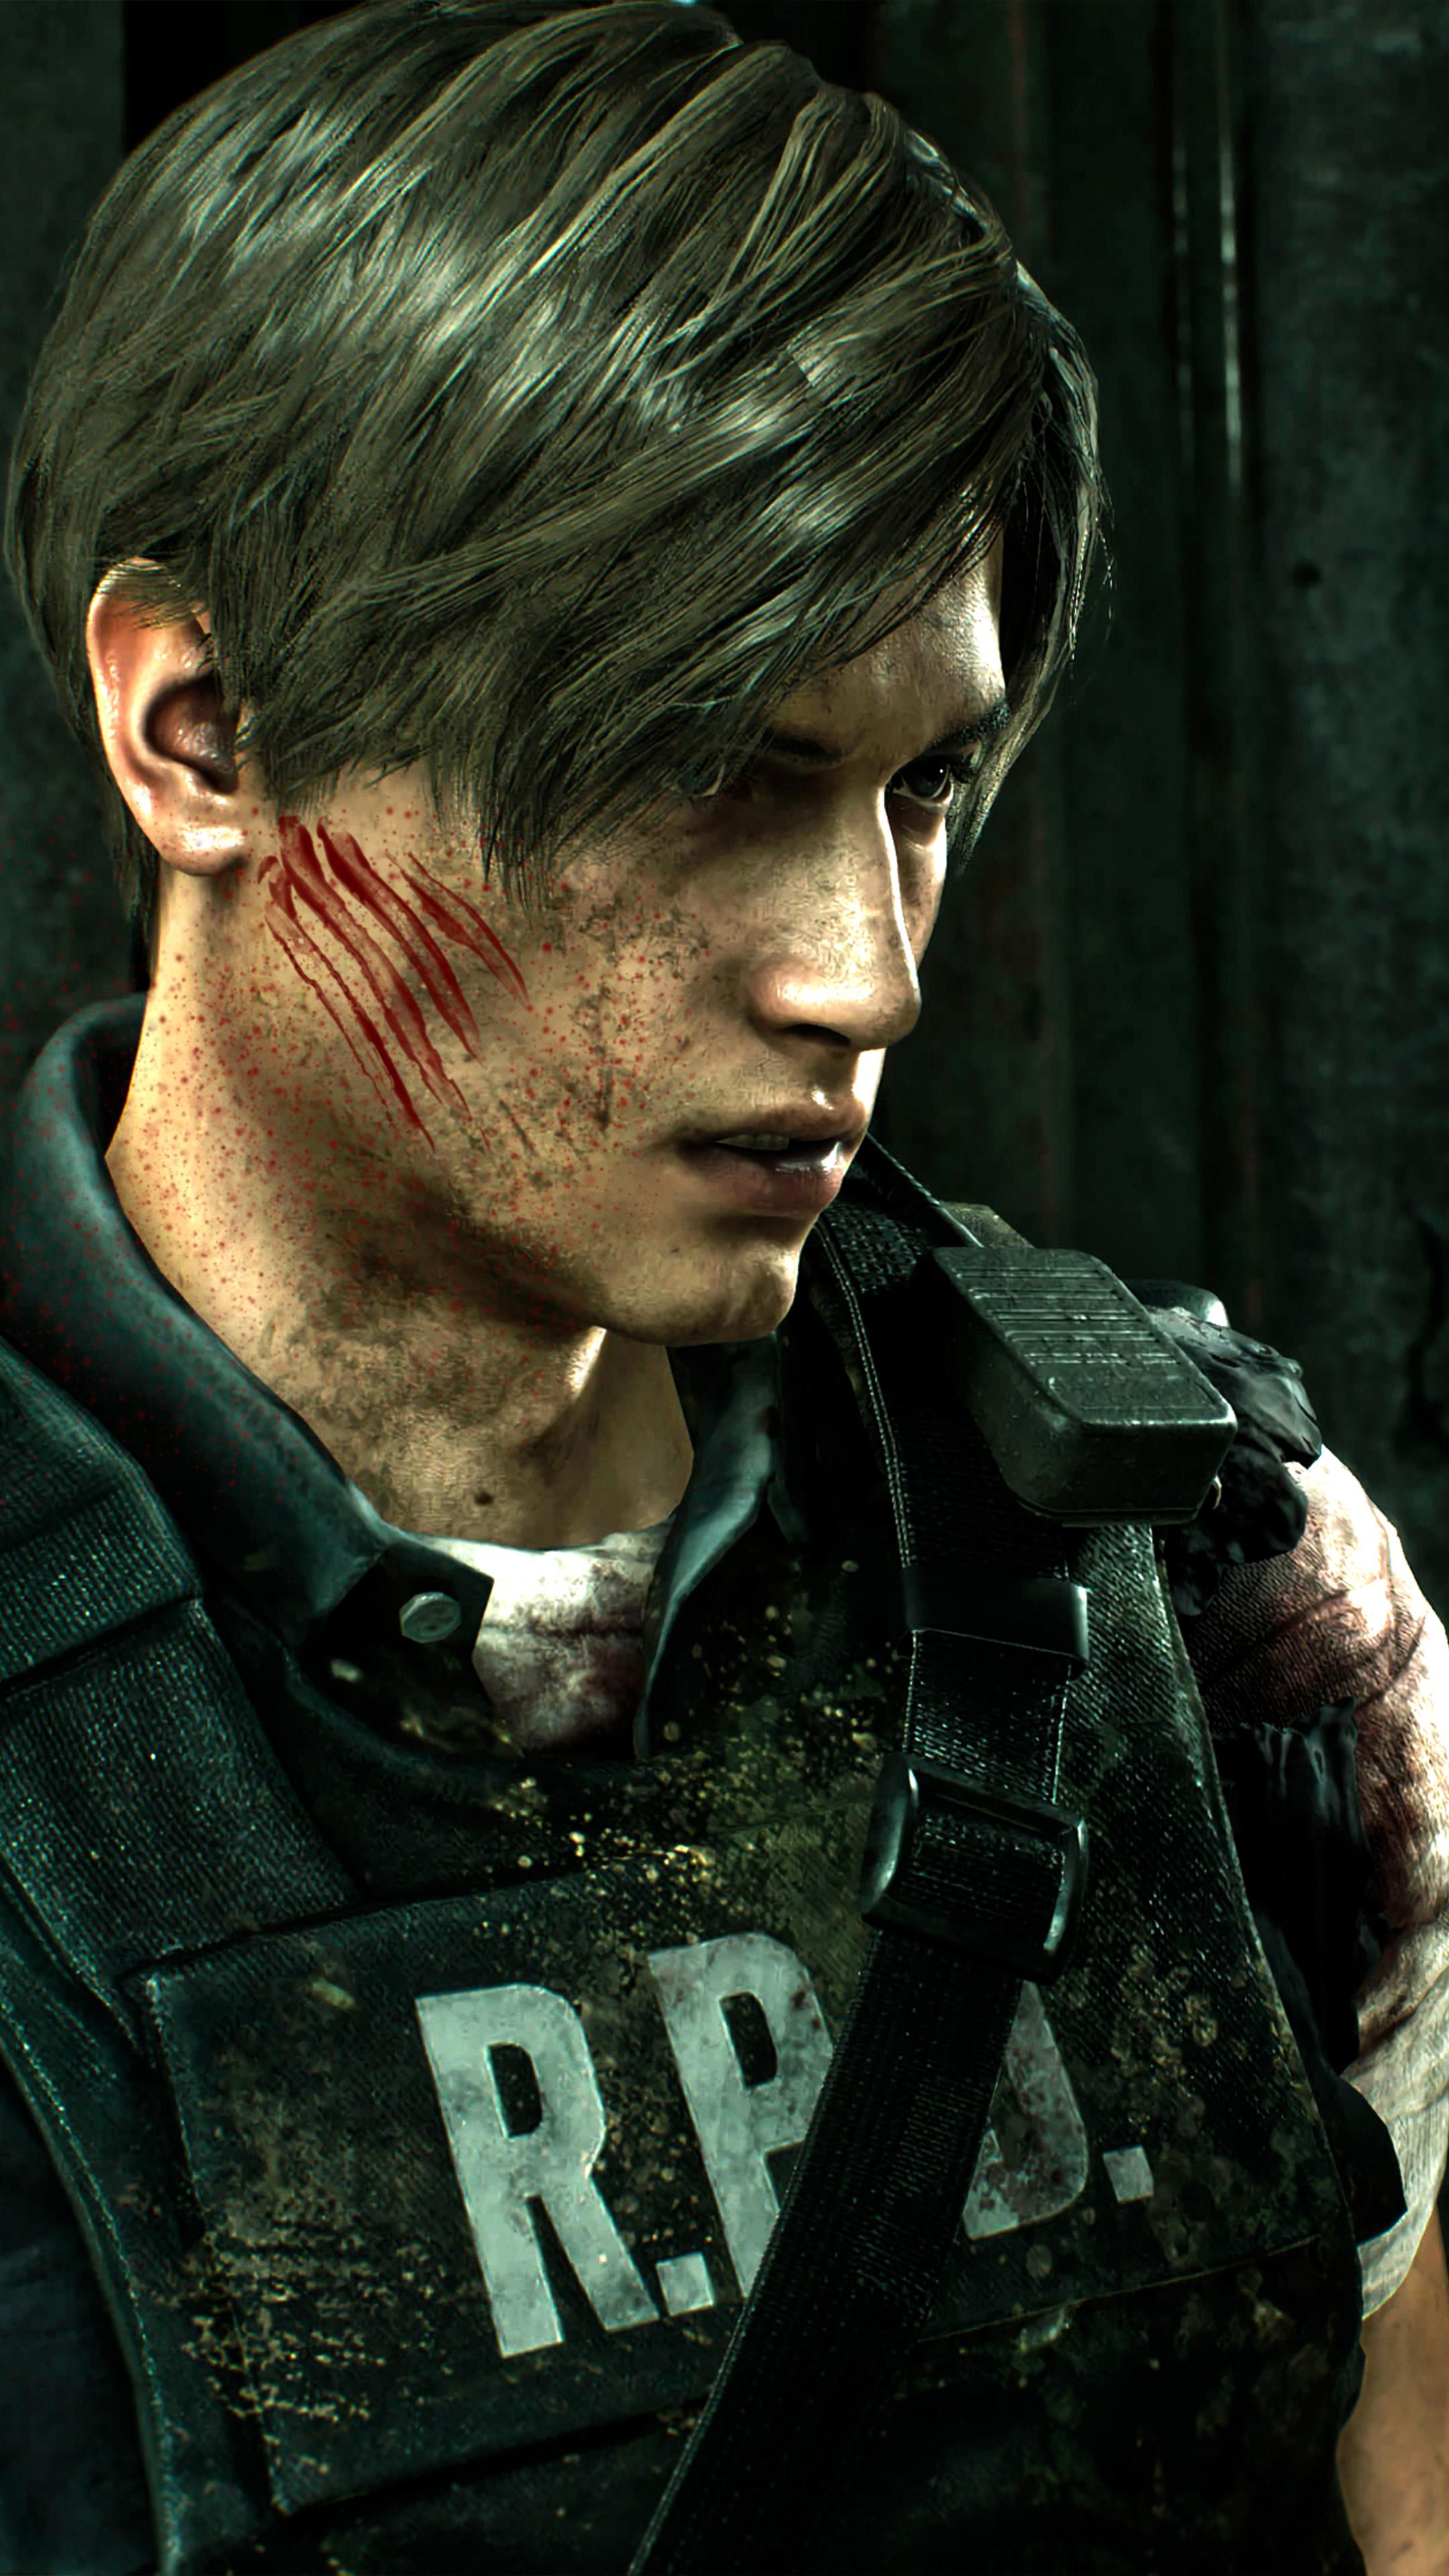 Leon S Kennedy Rpd Resident Evil 2 Free 4k Ultra Hd Mobile Wallpaper